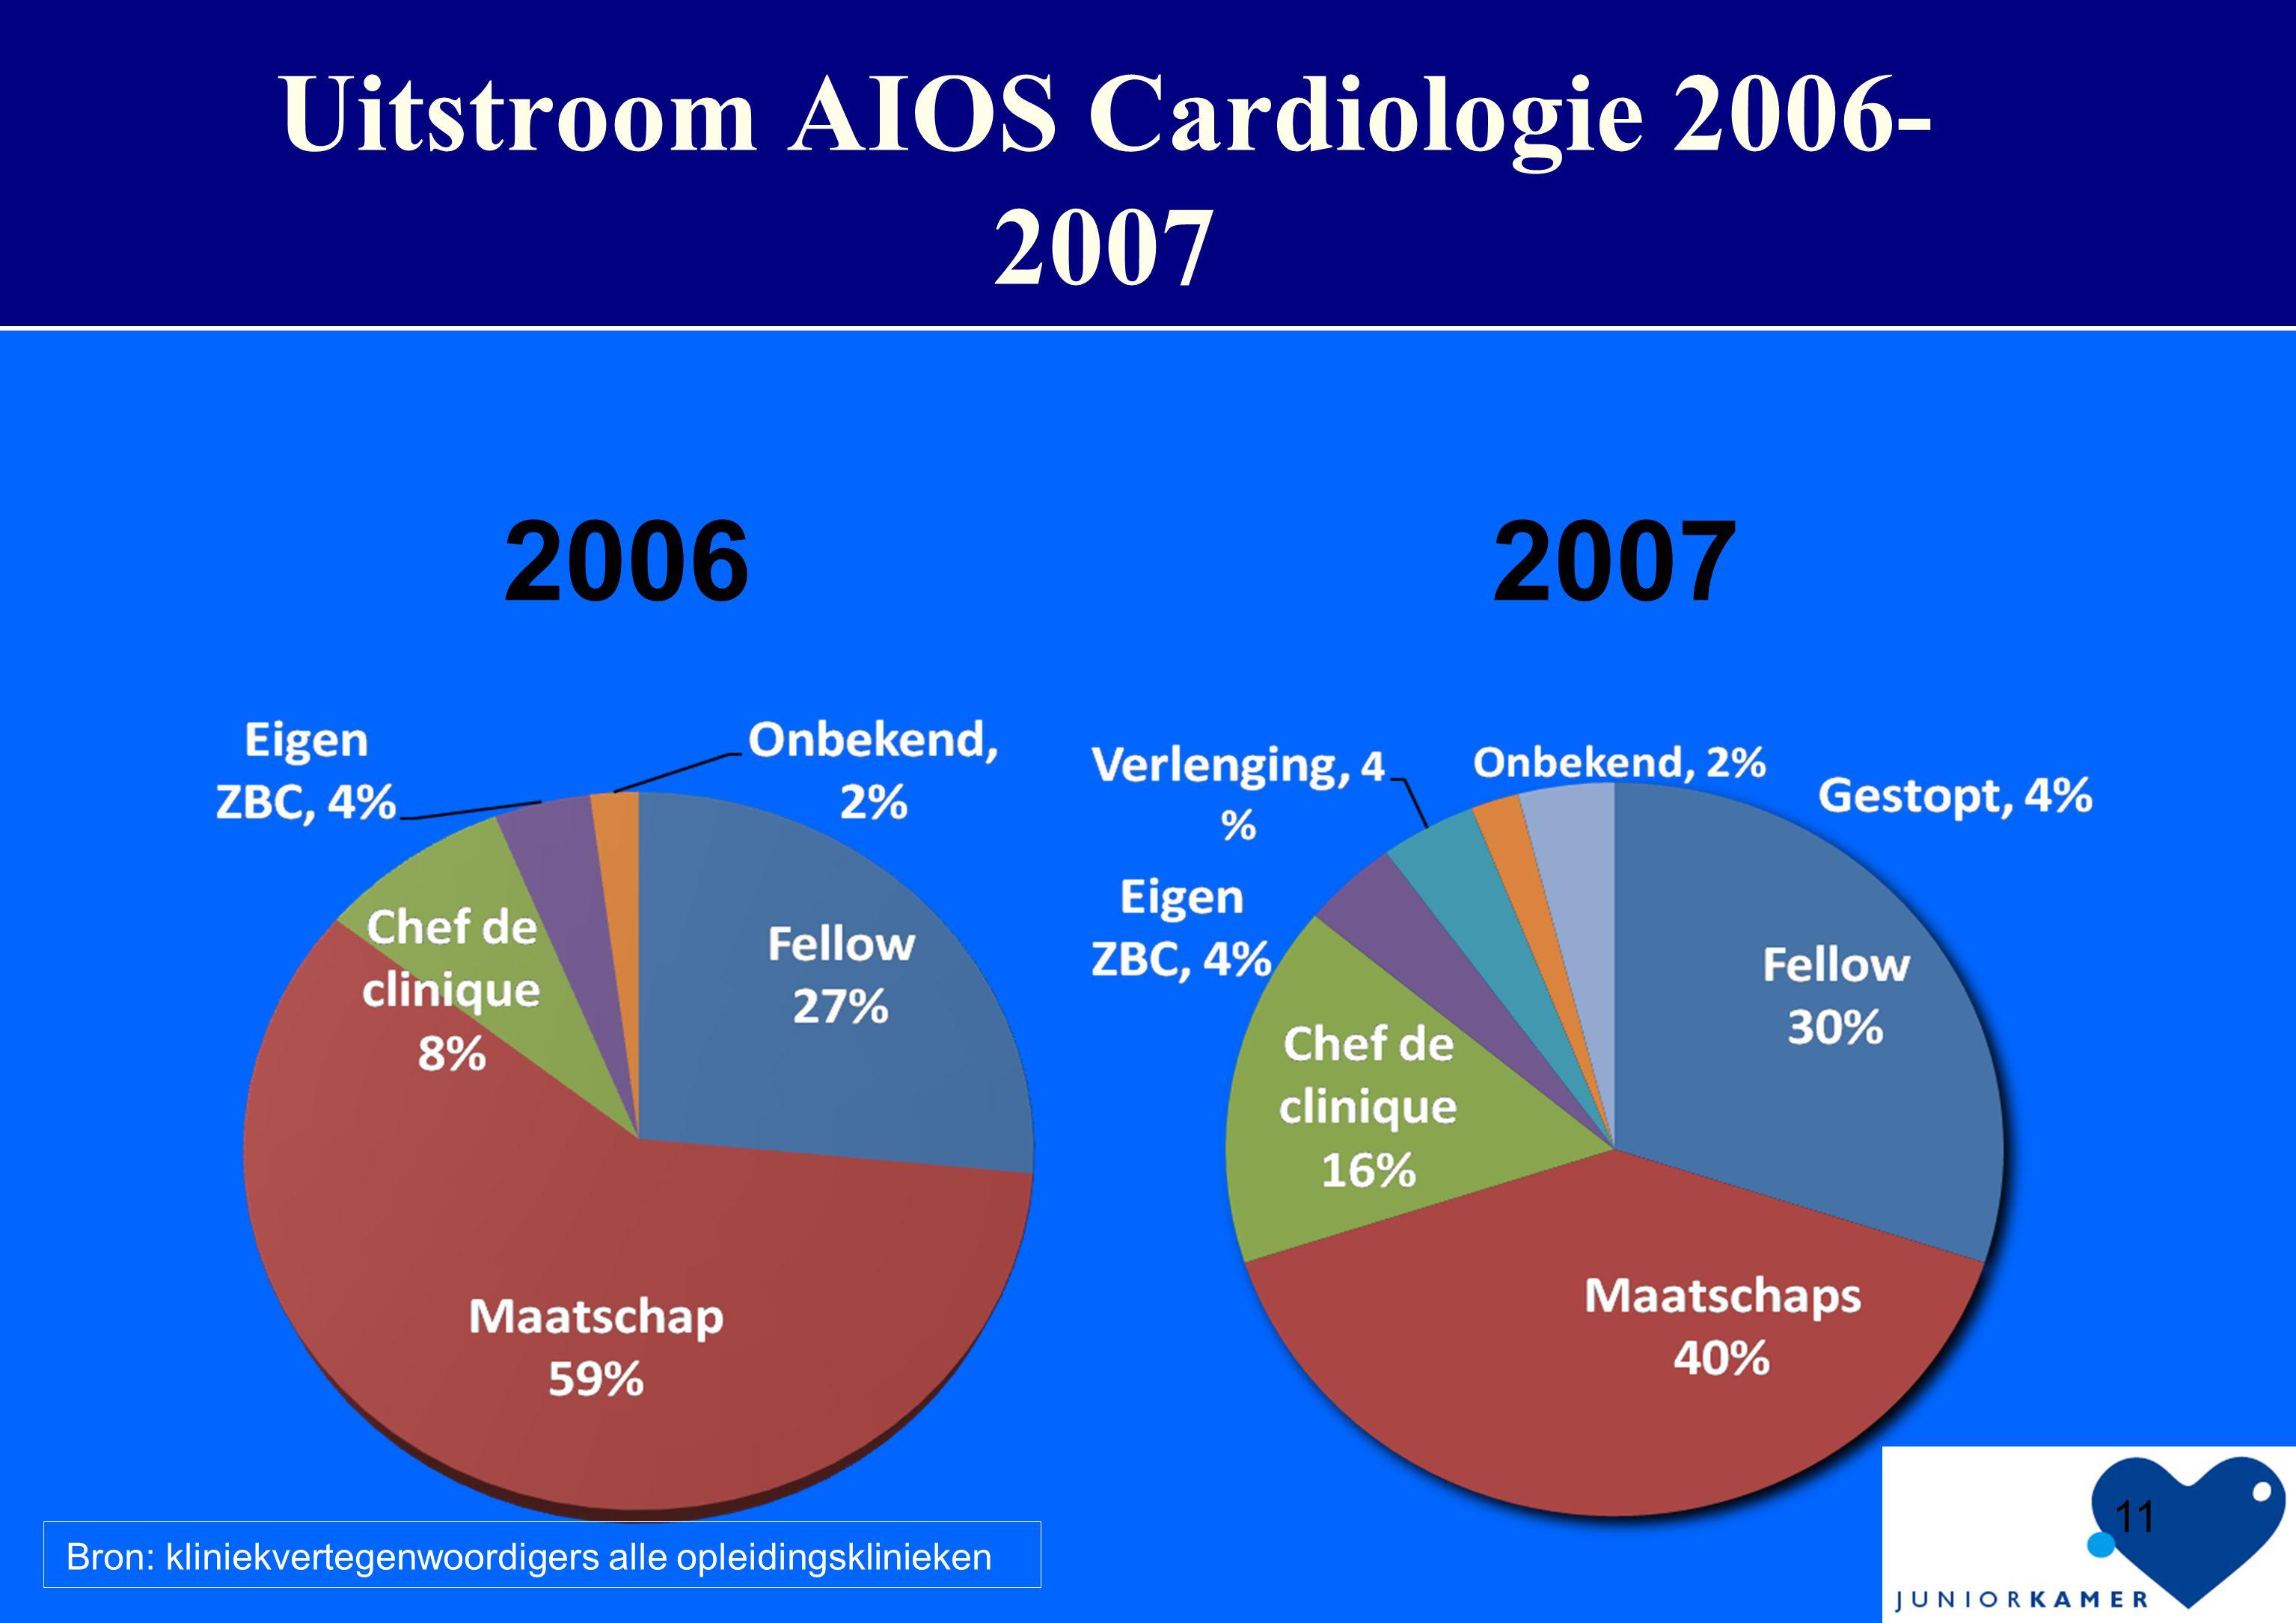 11 Uitstroom AIOS Cardiologie 2006- 2007 2006 2007 Bron: kliniekvertegenwoordigers alle opleidingsklinieken